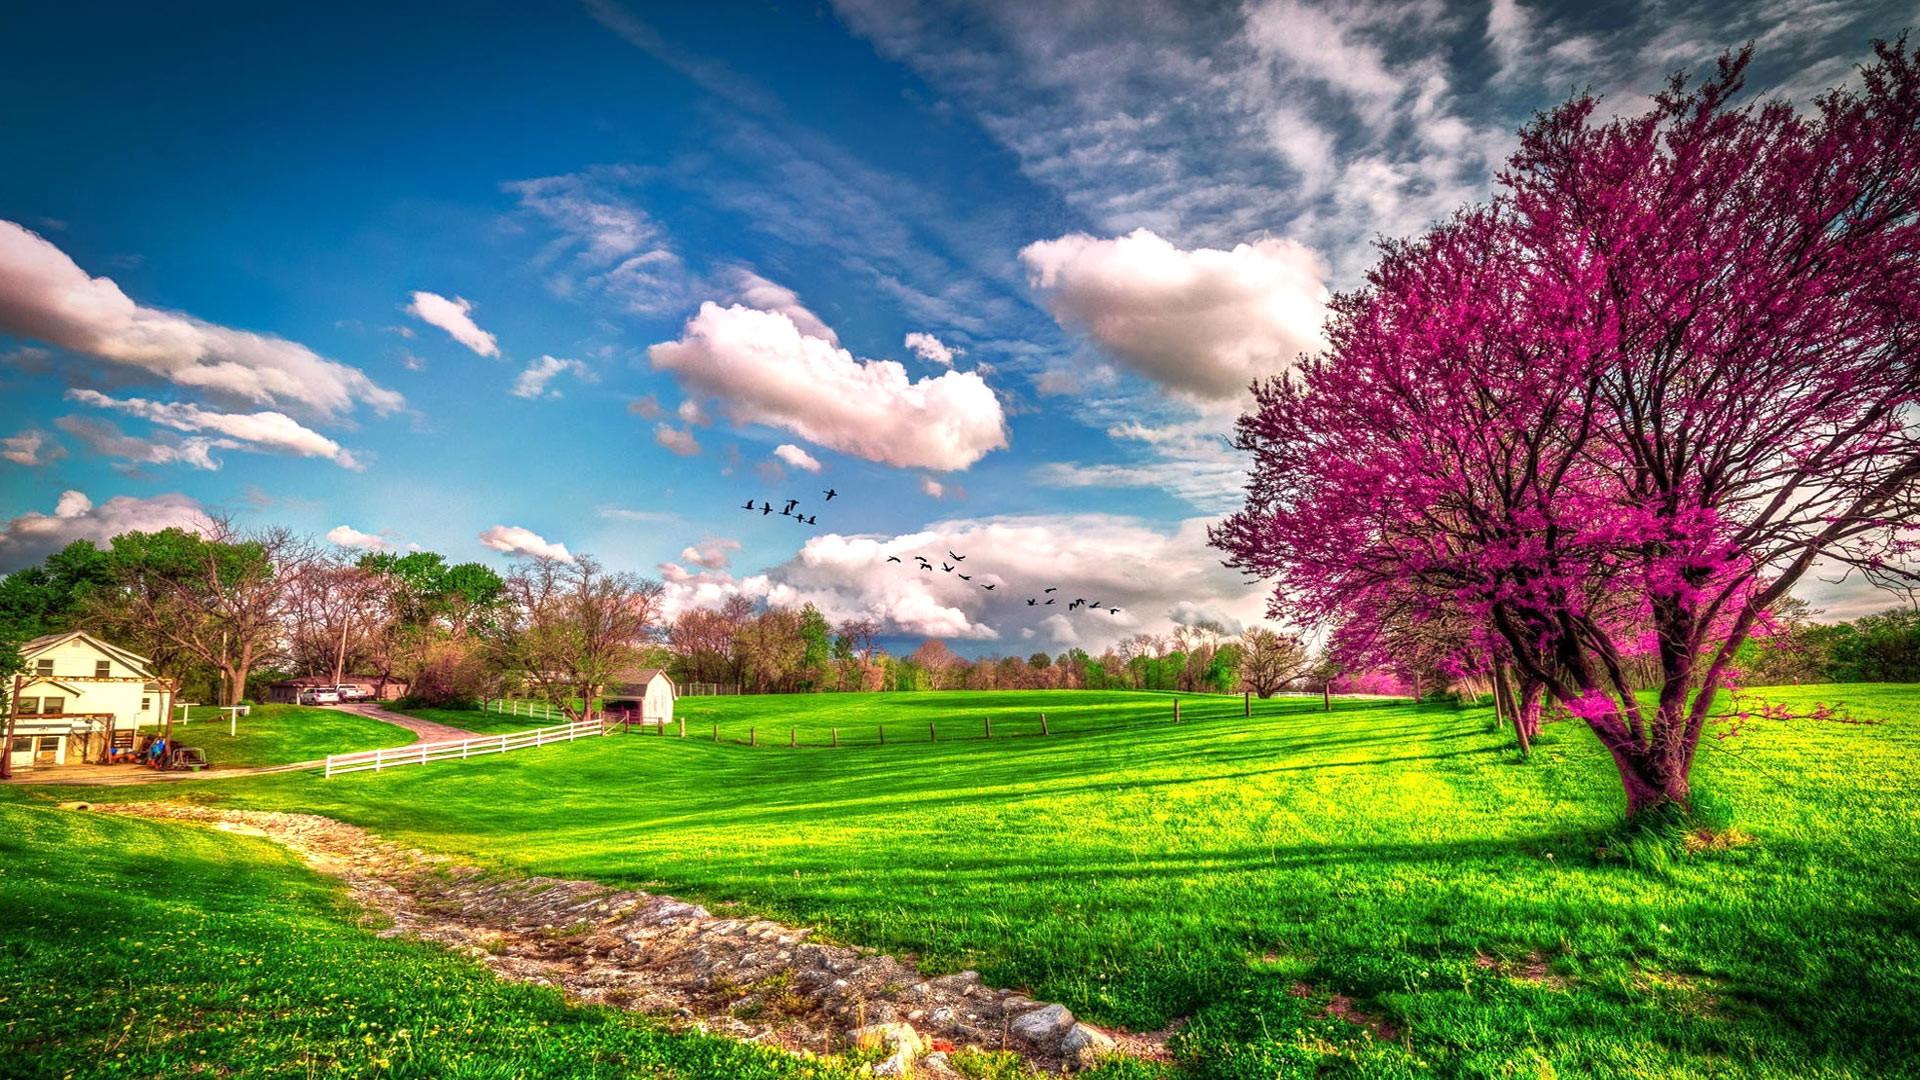 Landscape beautiful spring nature -. Spring Wallpapers. Seasons Wallpapers.  download beautiful HD Wallpaper